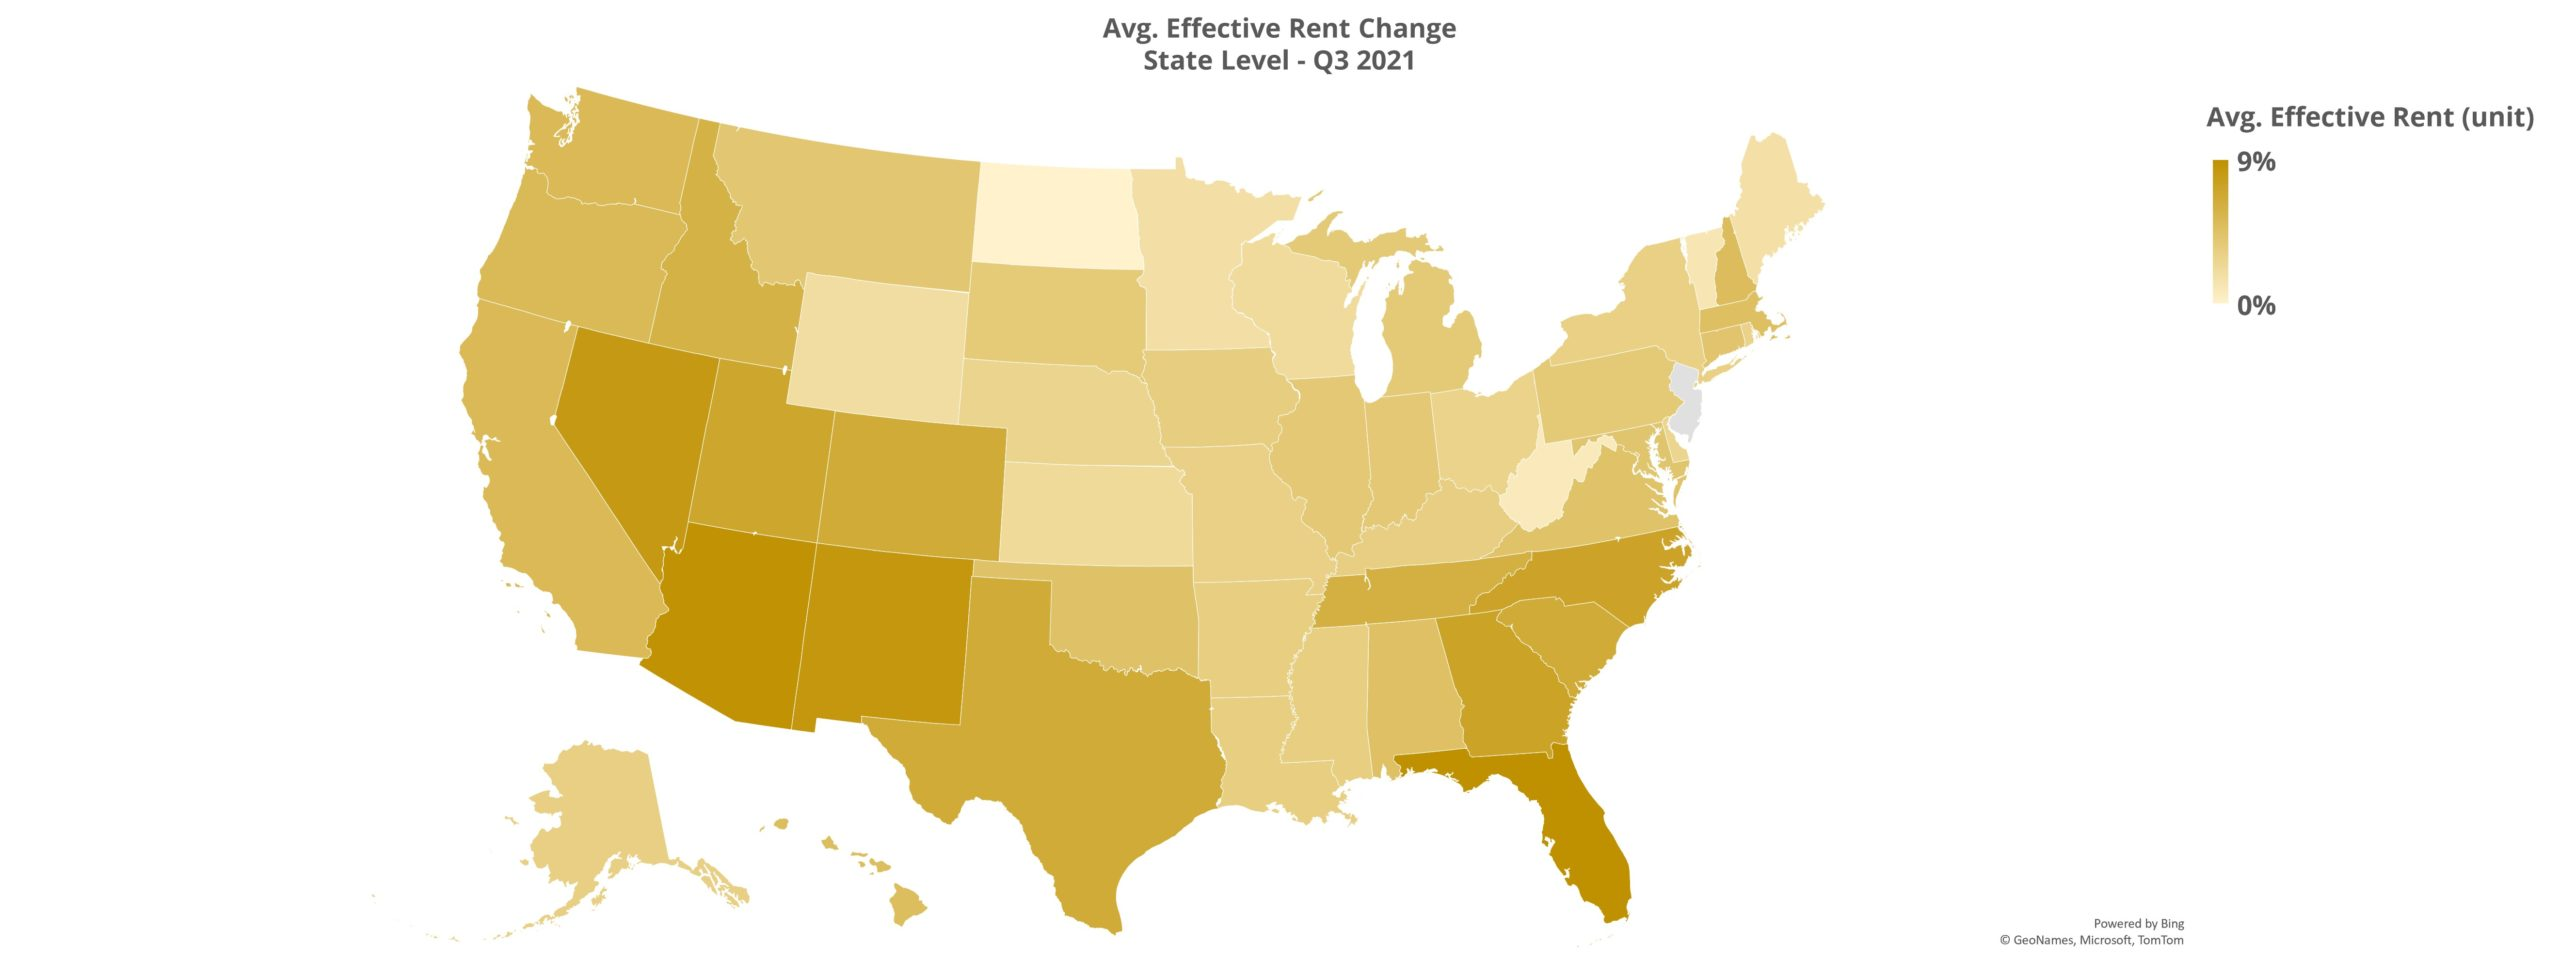 Avg. Effective Rent Change